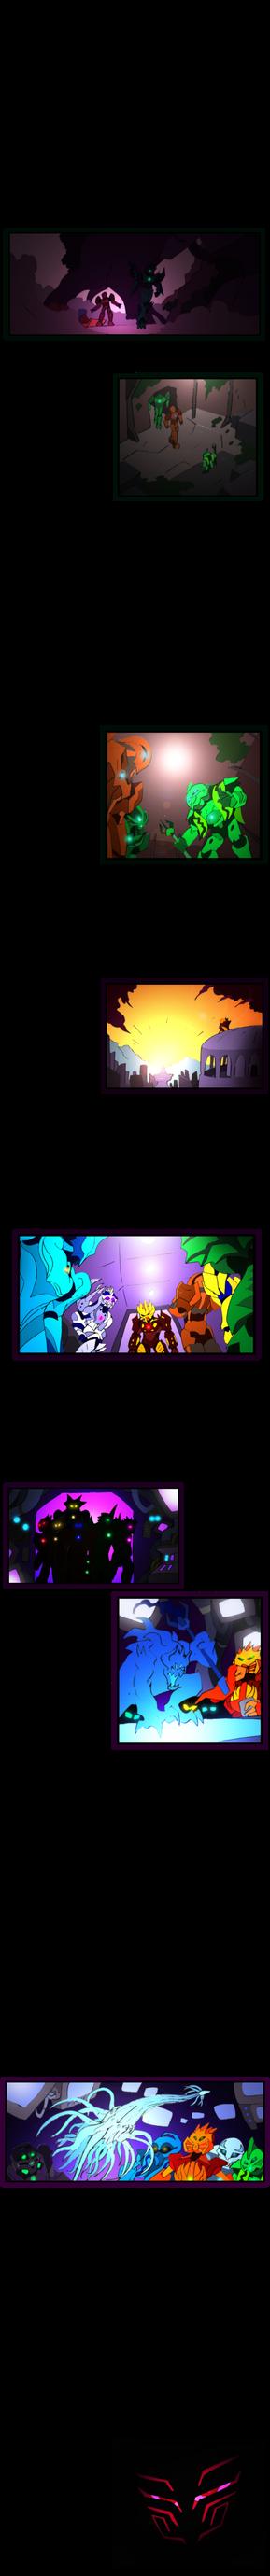 Bionicle- Nova Orbis- Mystery- Chapter 15